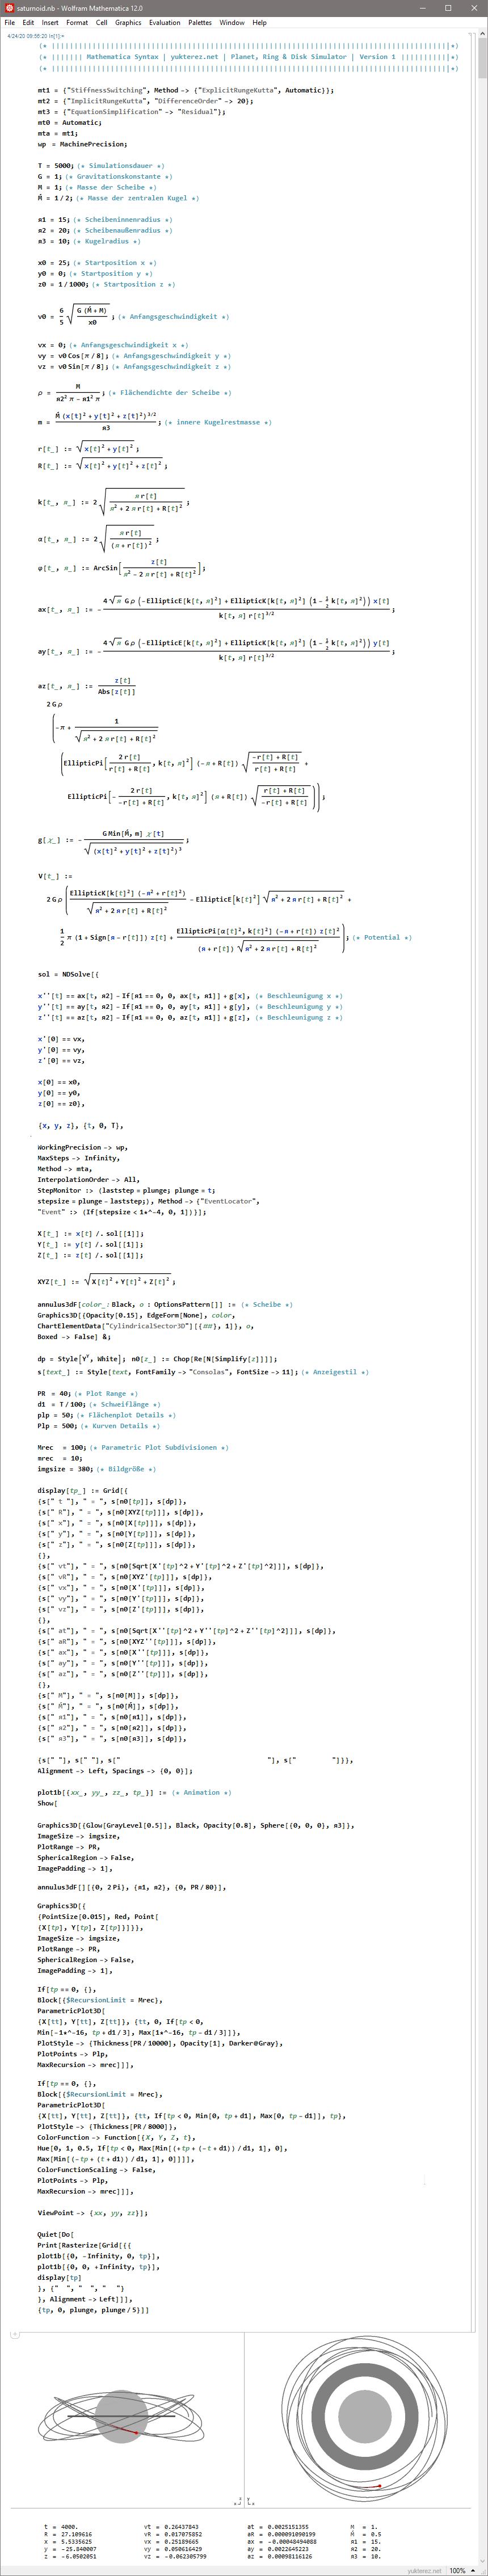 Simulator Code & Animation